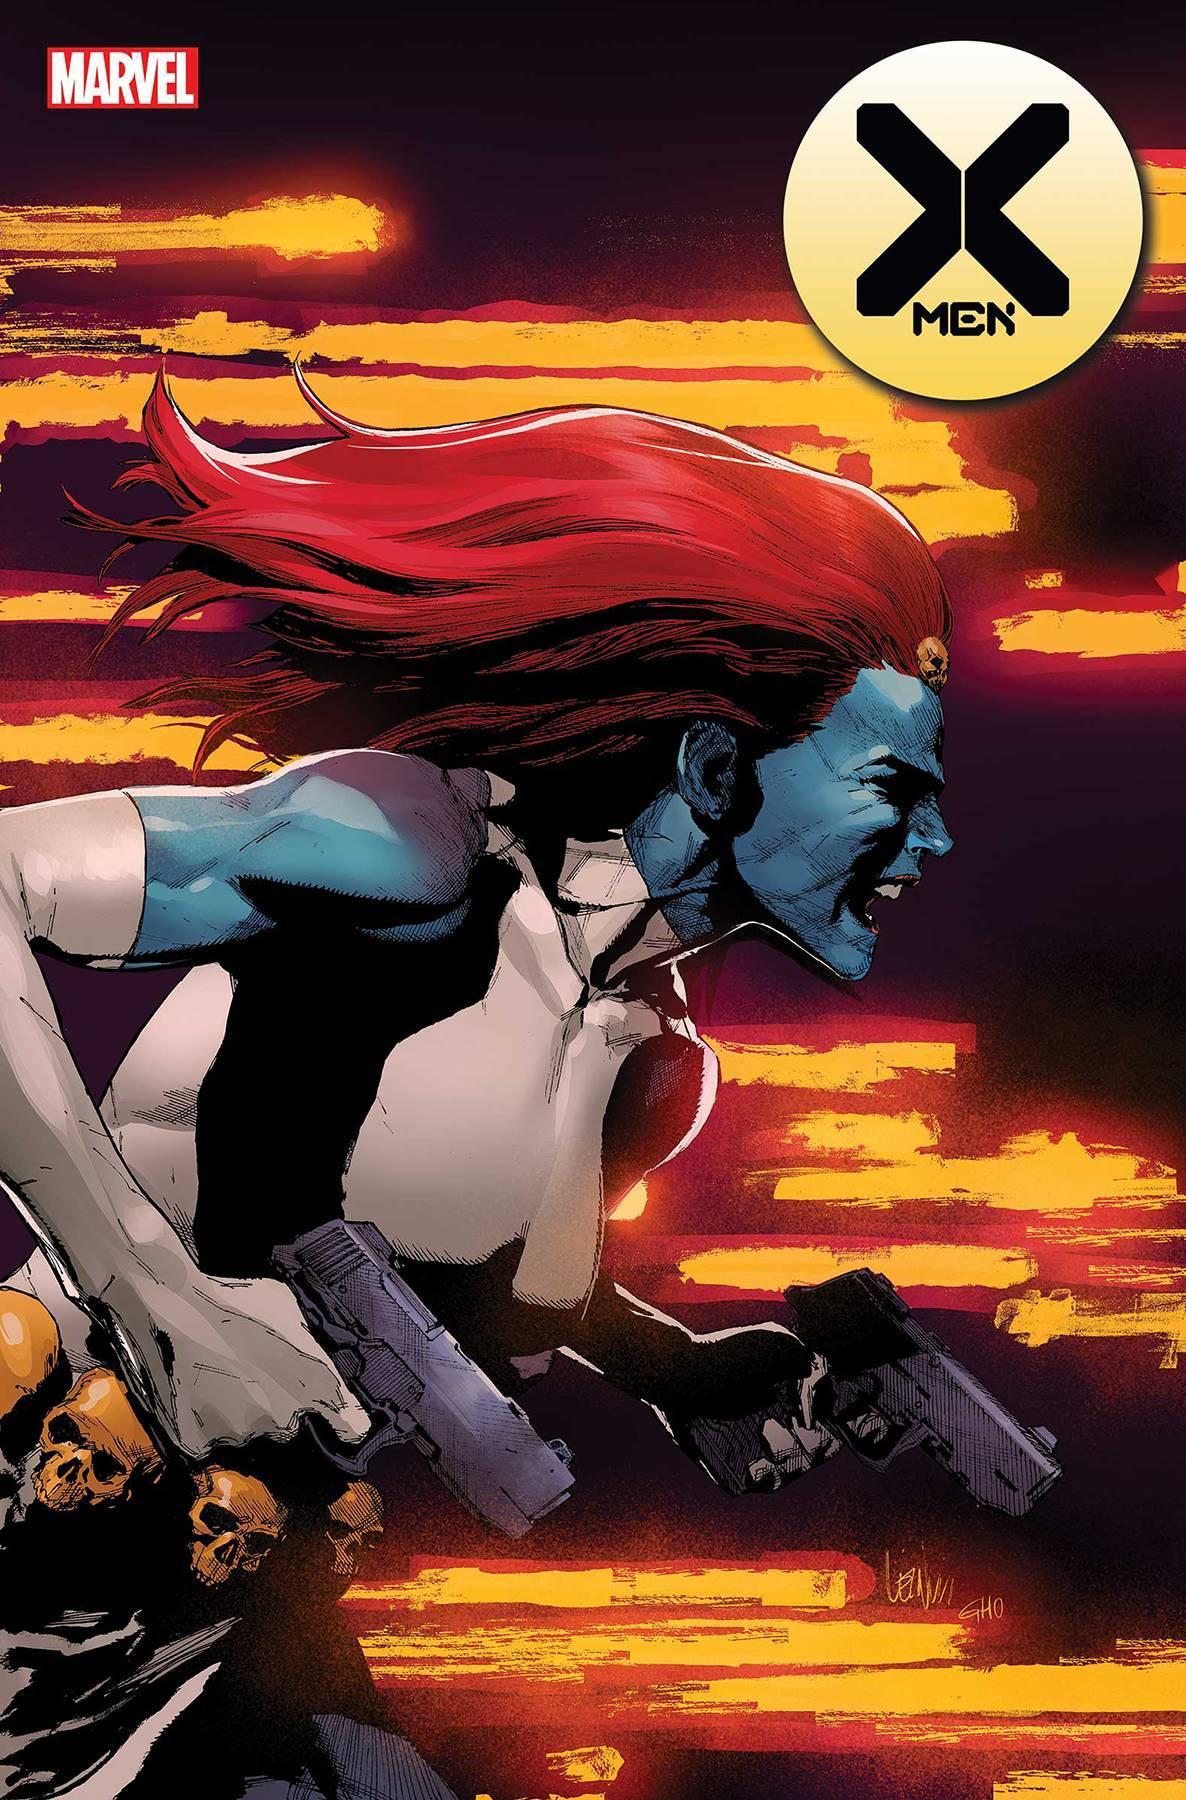 X-Men Vol 5 #6 Cover A Regular Leinil Francis Yu Cover (Dawn Of X Tie-In)